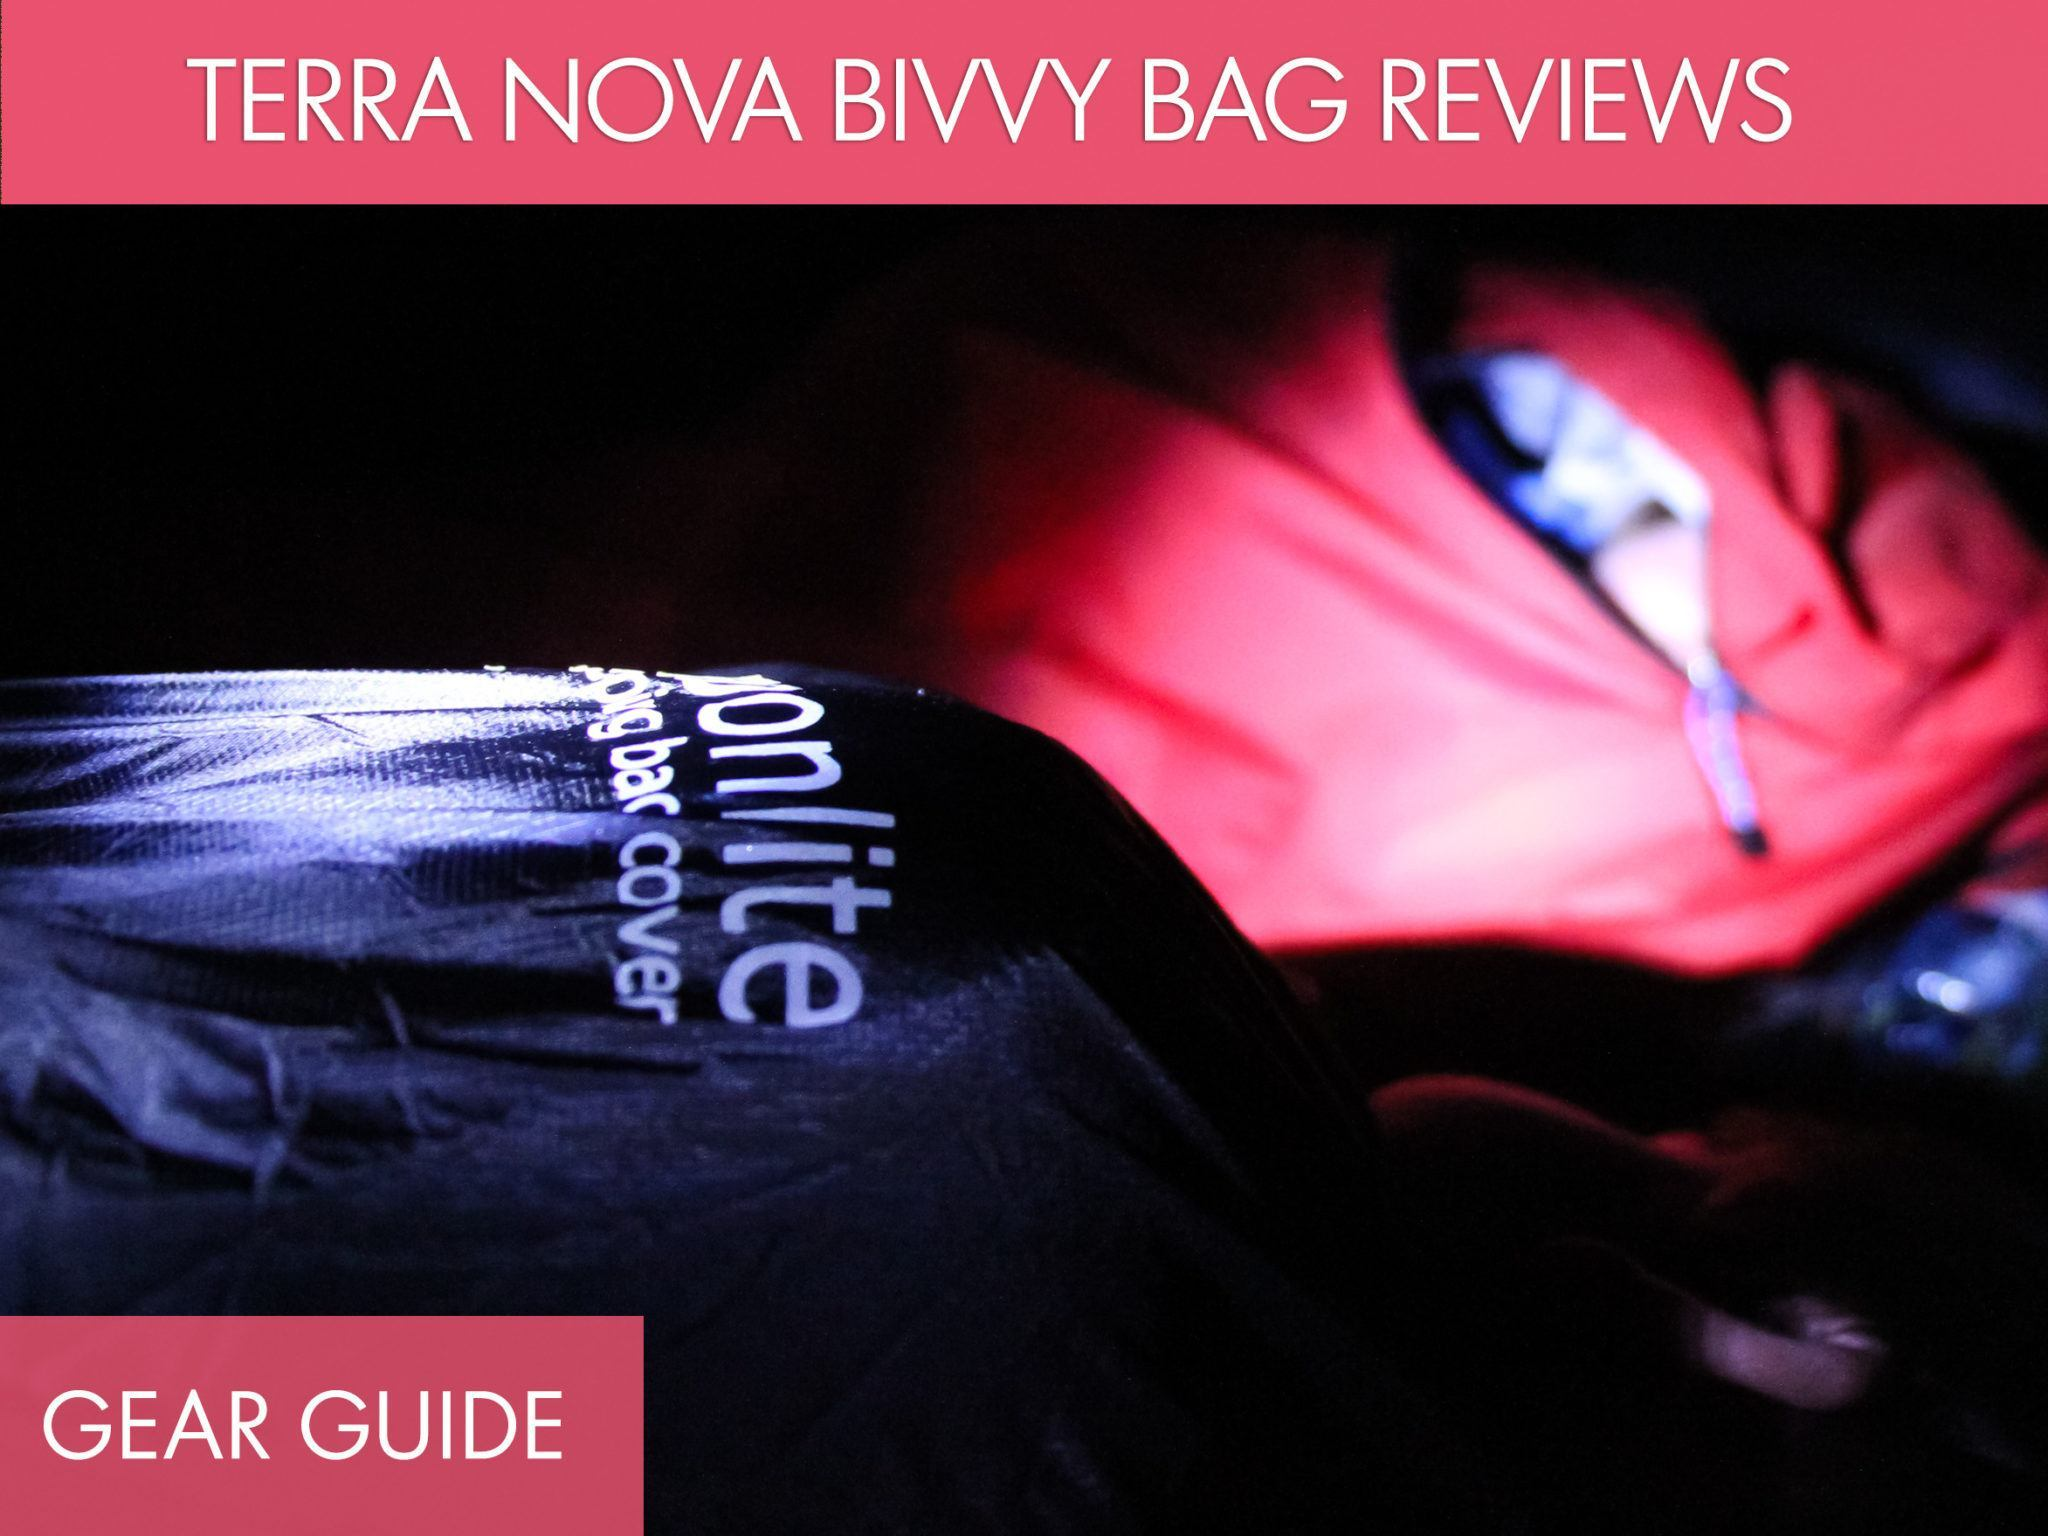 Bivy Bag Gear Guide